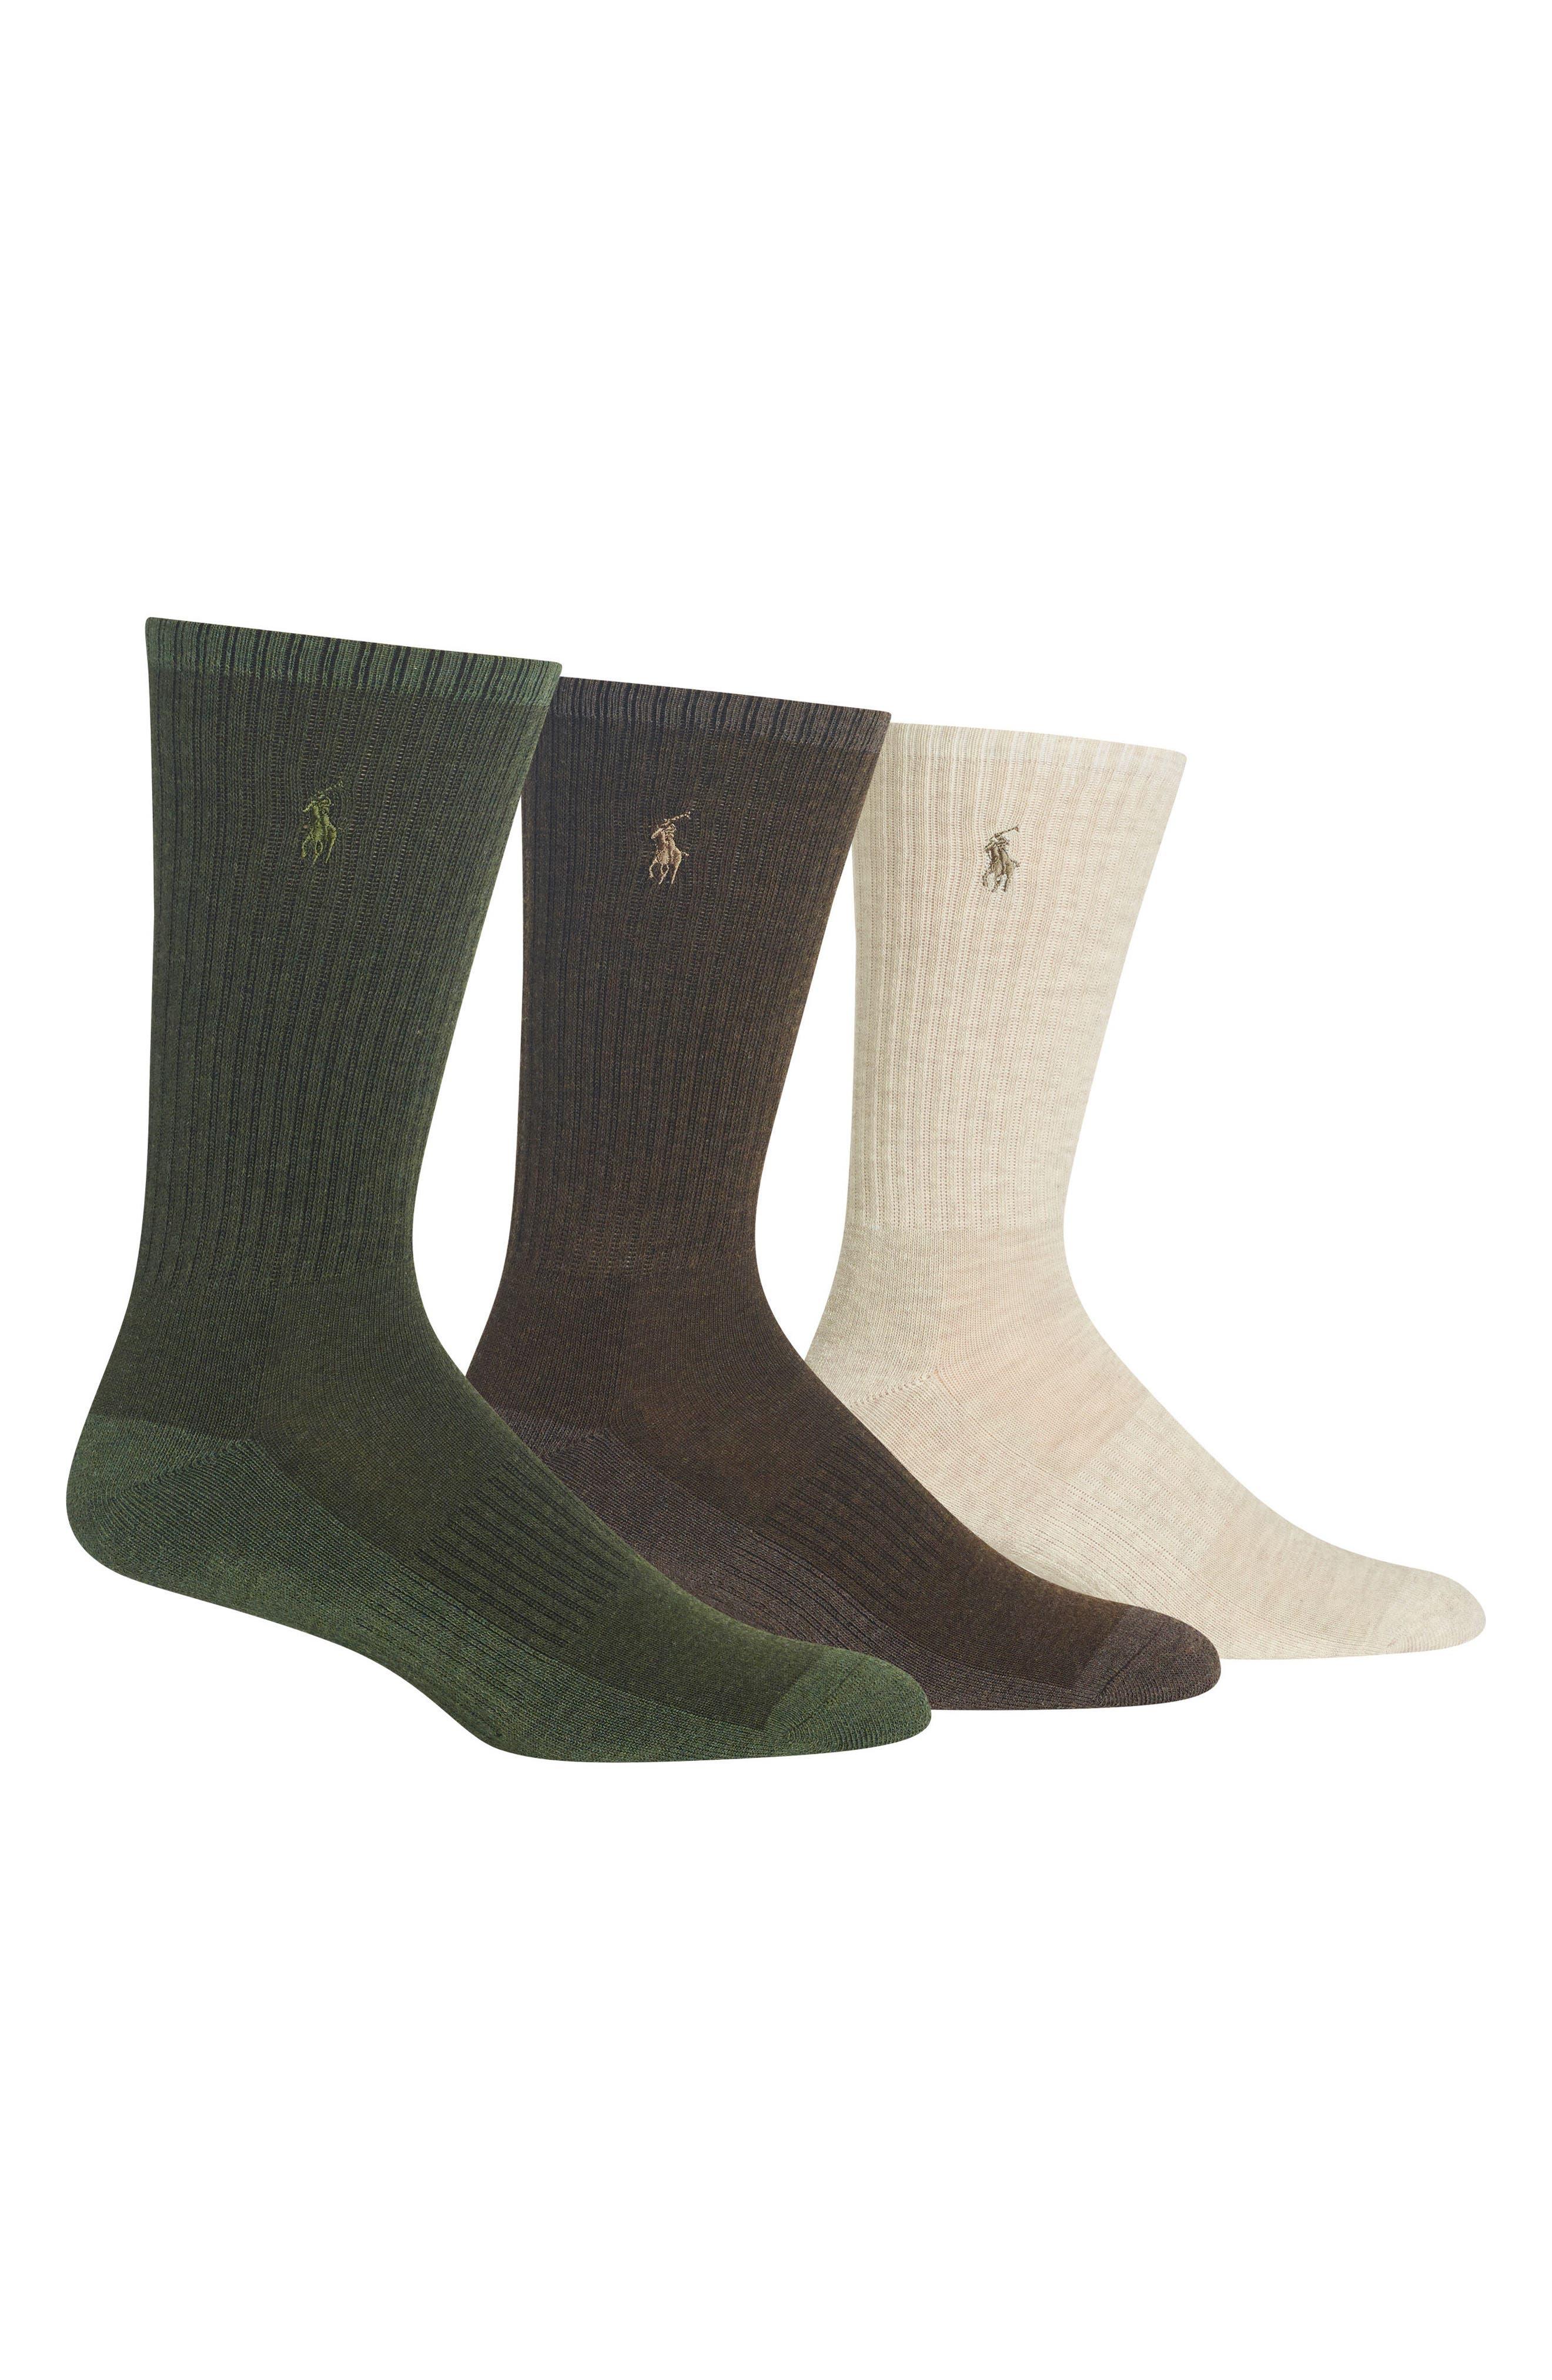 3-Pack Socks,                         Main,                         color, 364